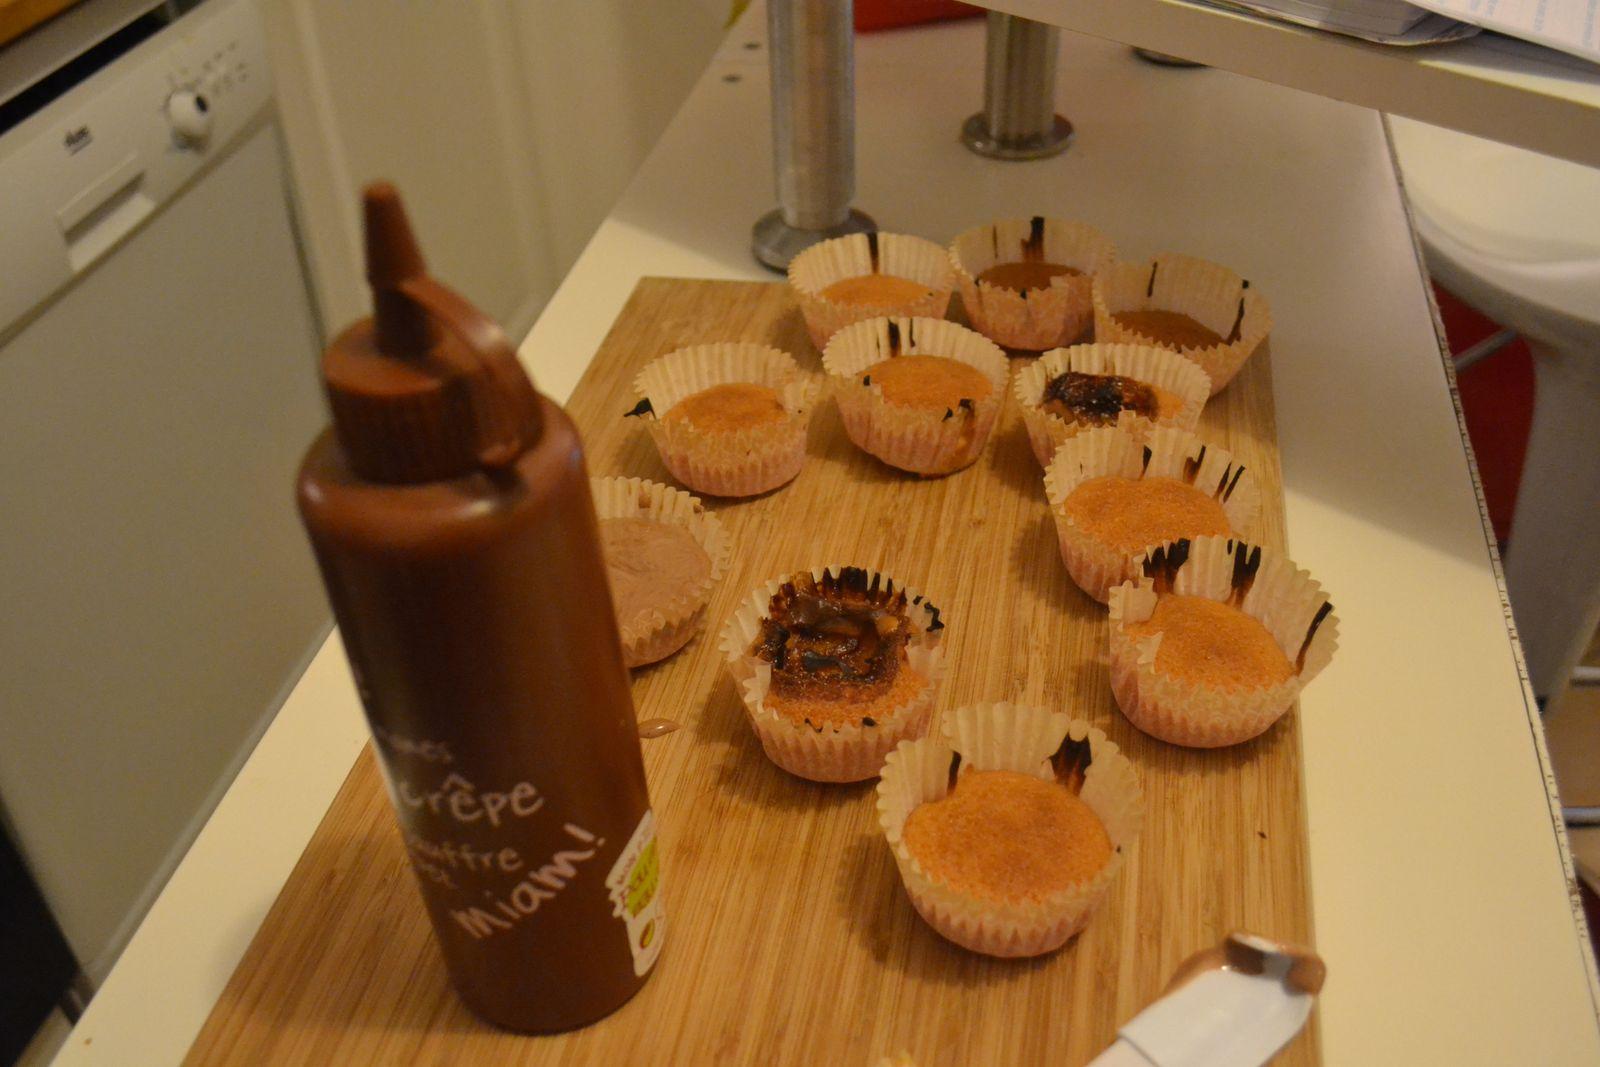 Cupcake Choco-Mallow